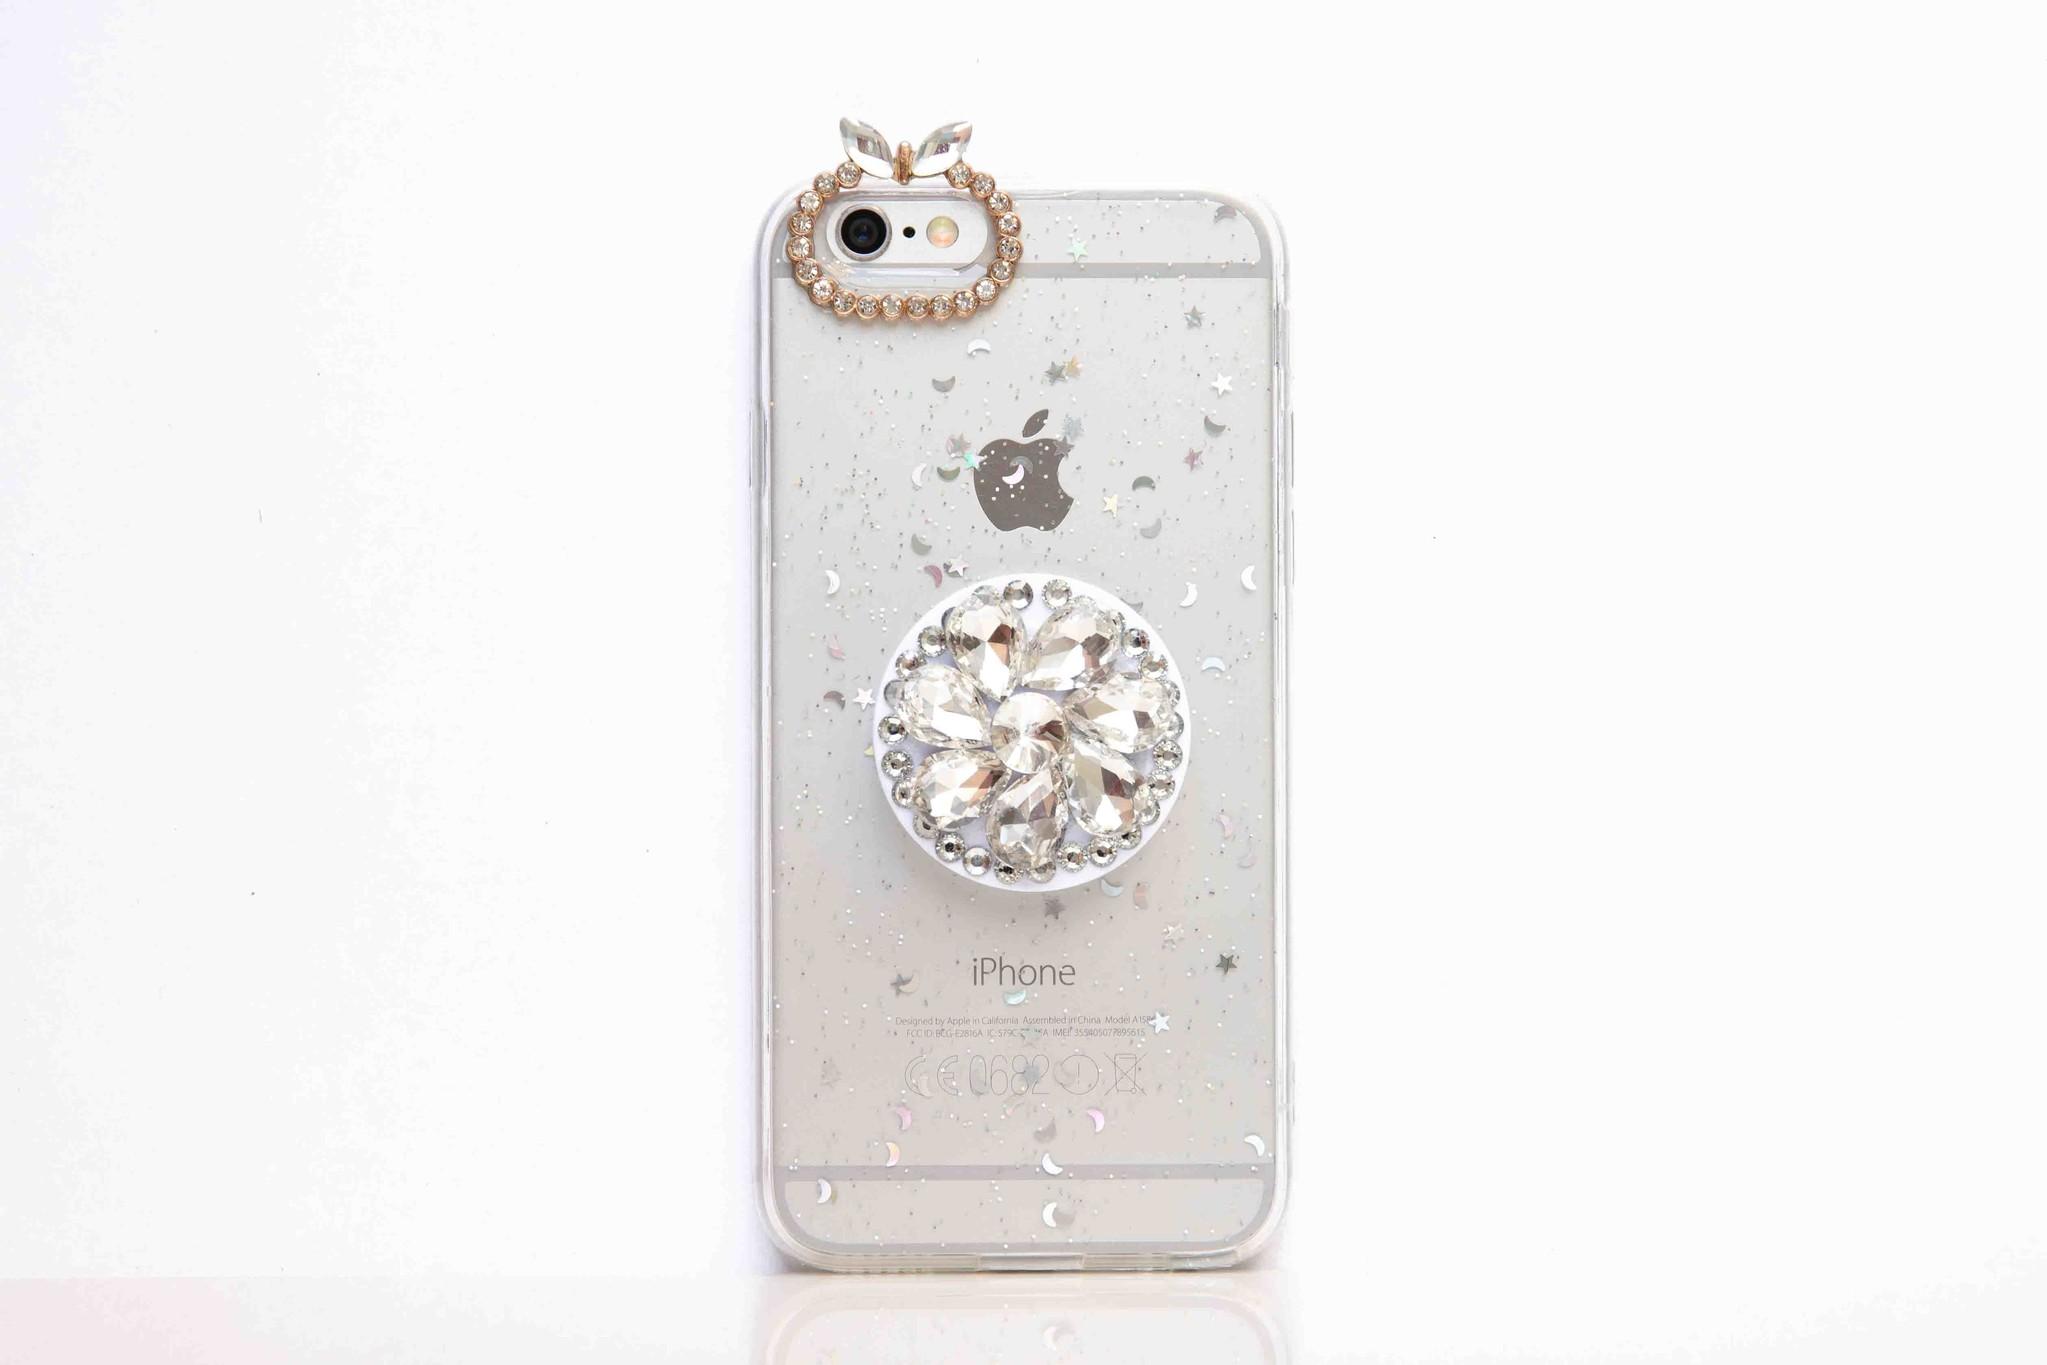 Smartphonehoesje iPhone 7 / 8, bling (met handige houder) | Transparant